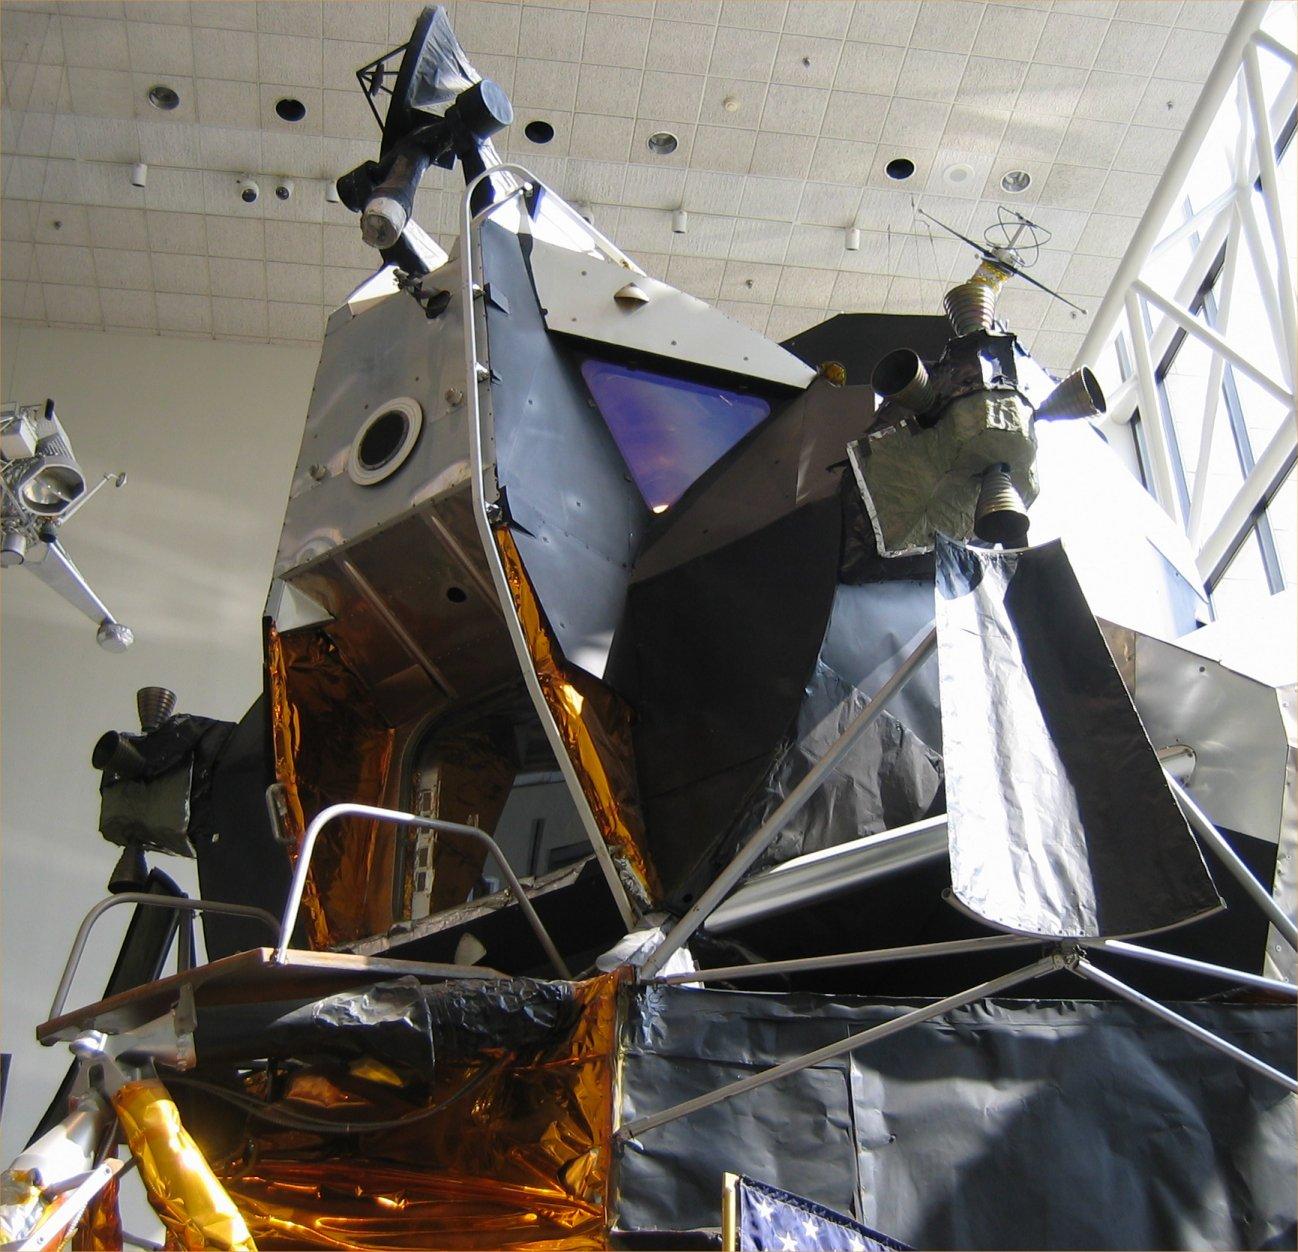 astronomy models - photo #35